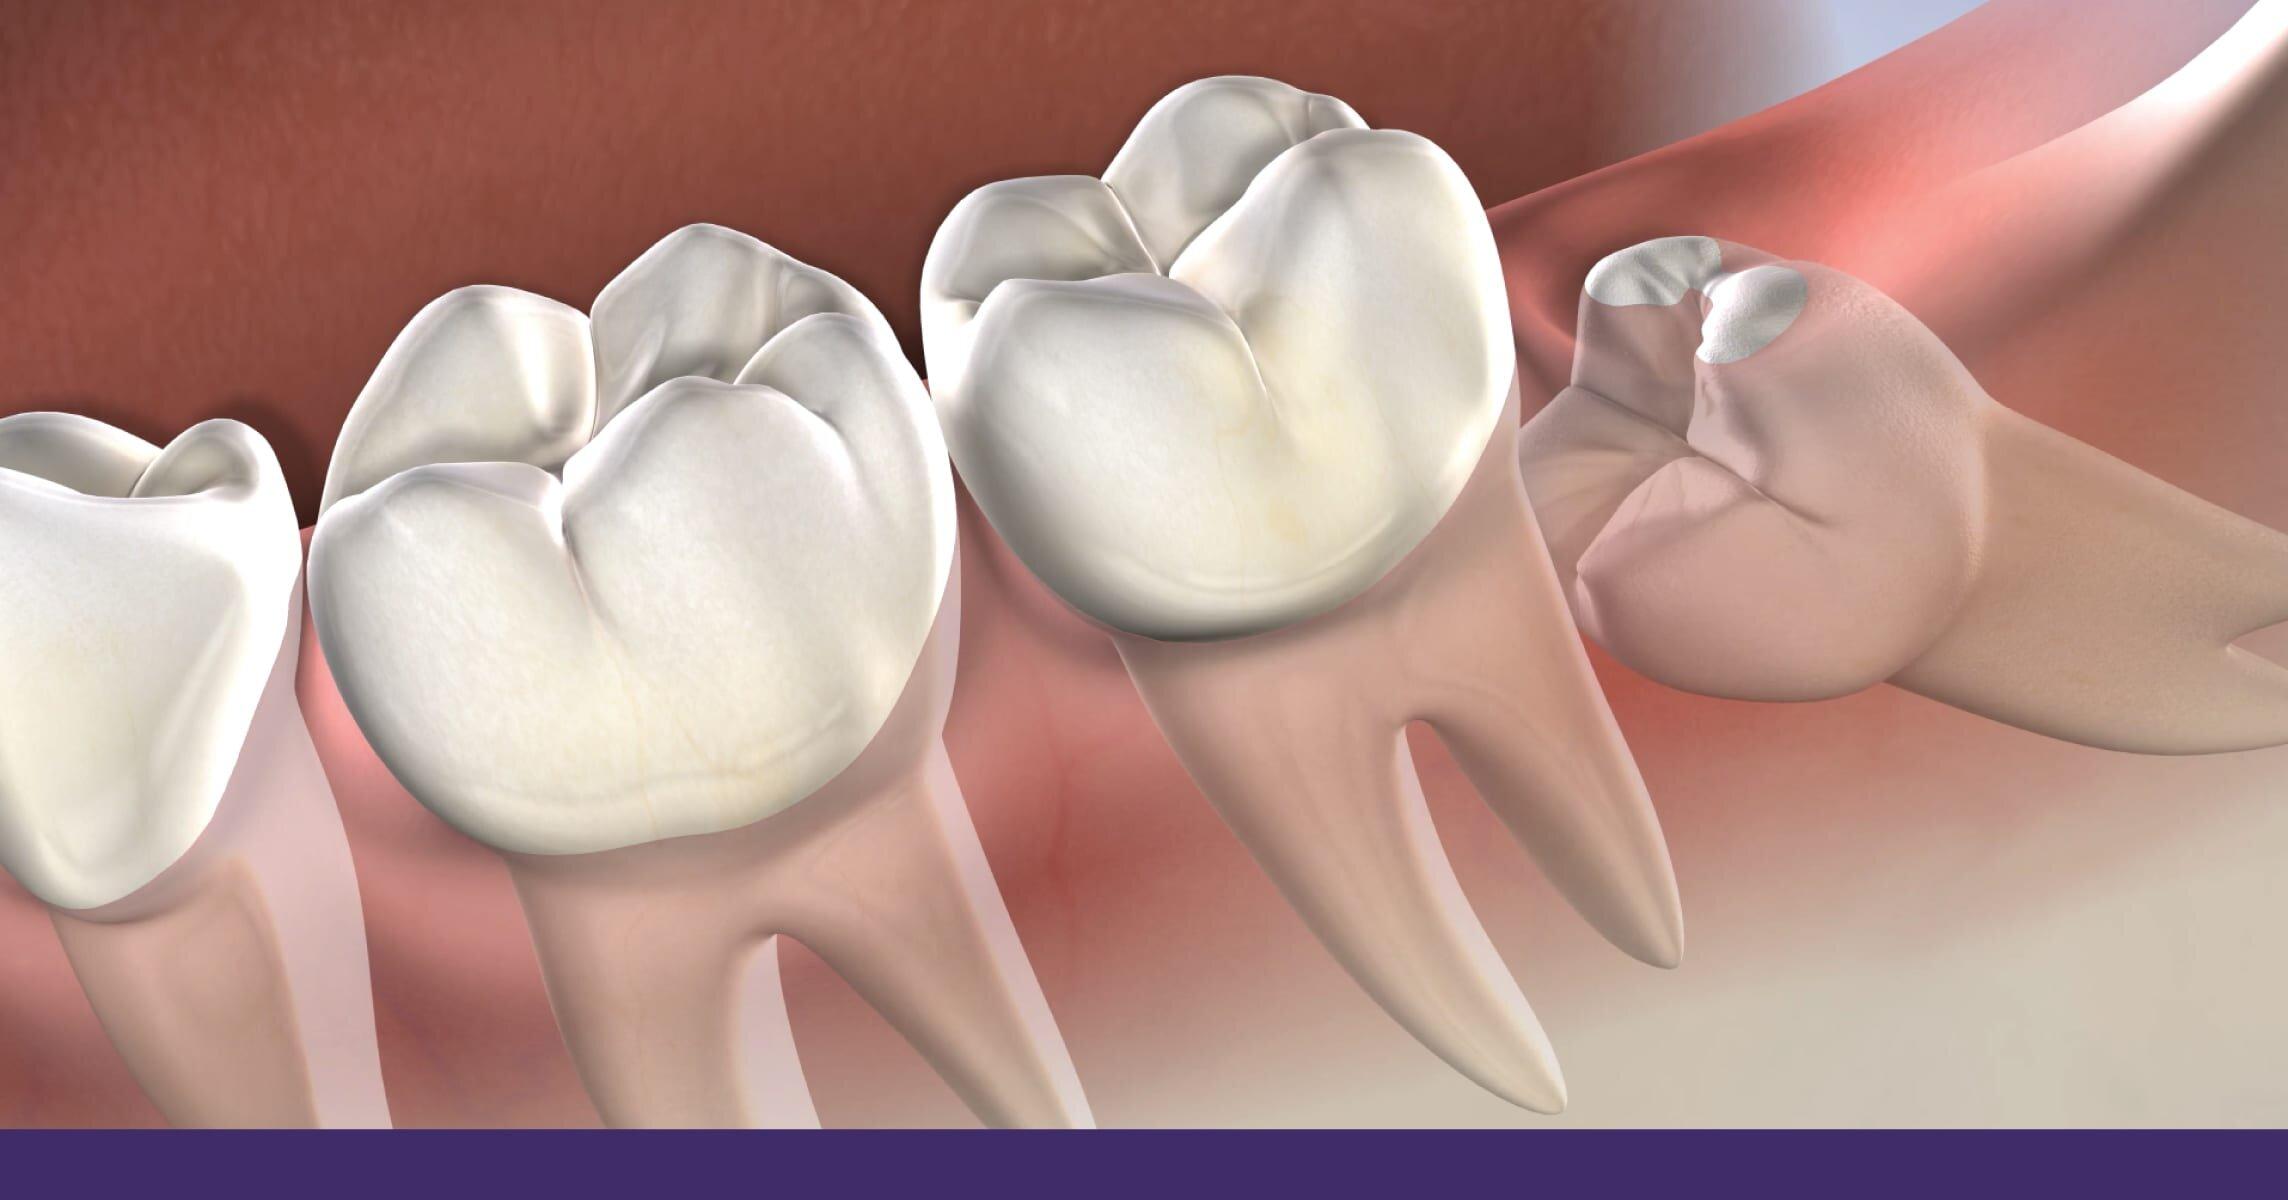 wisdom-teeth-removal-procedure-santa-fe-nm.jpg